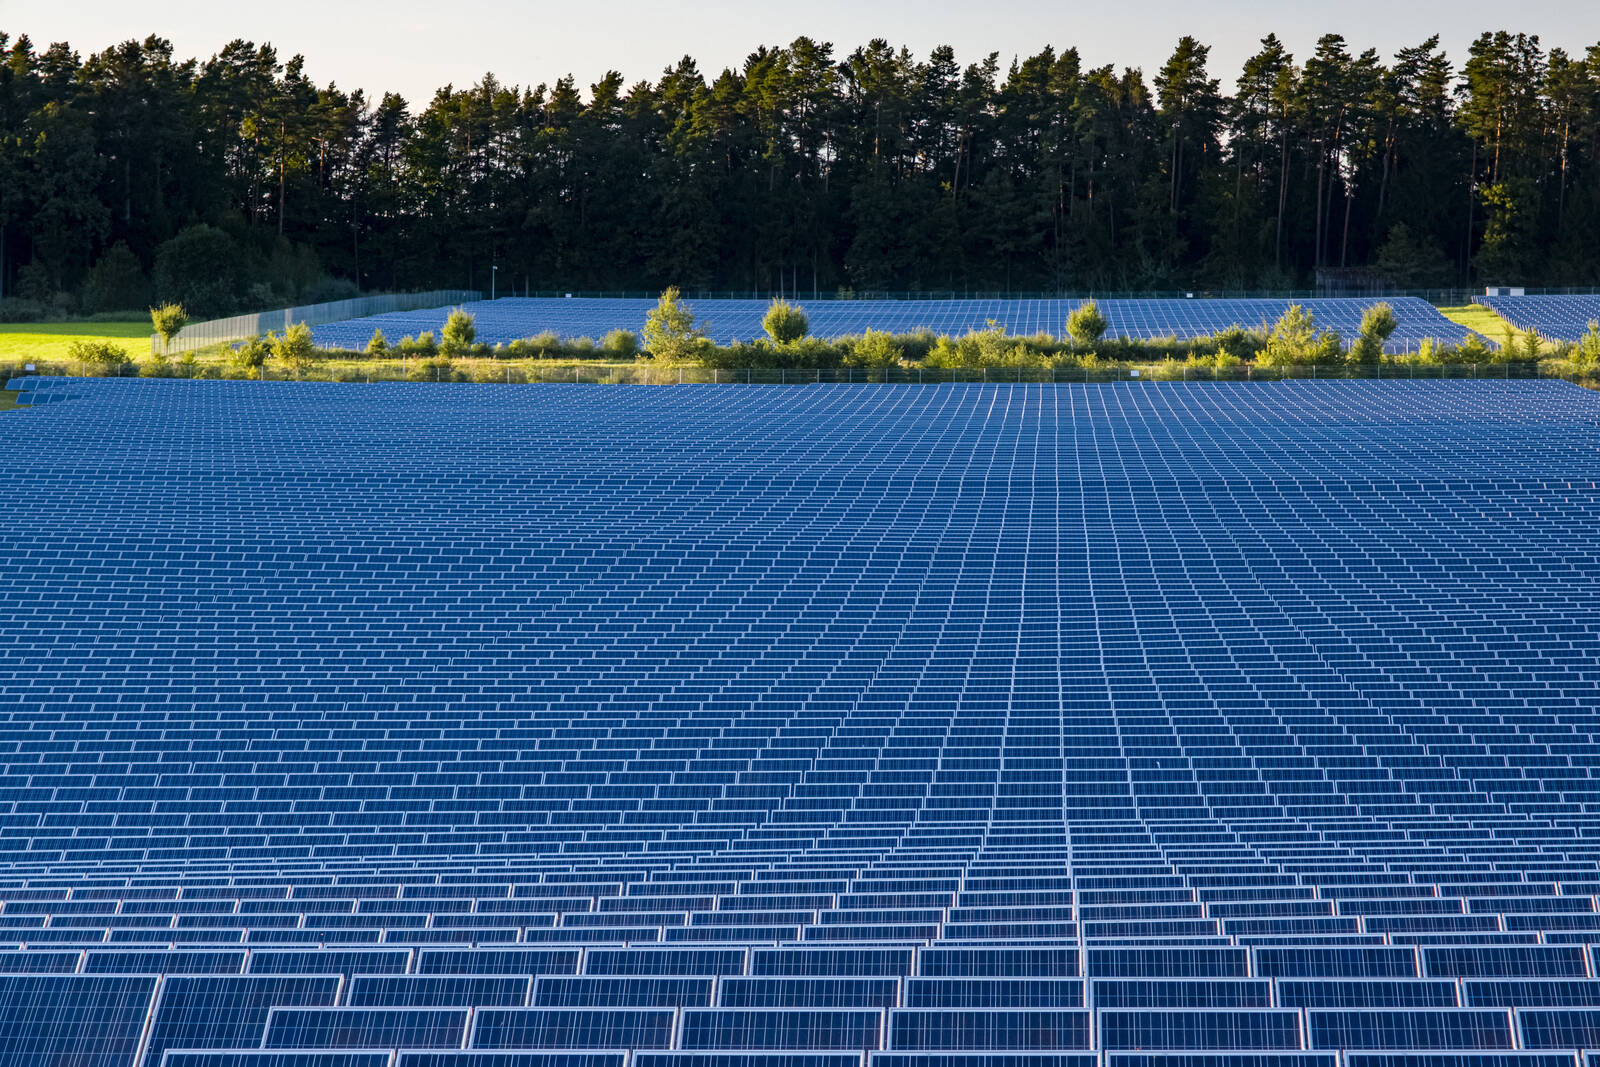 Many Photovoltaik solar panels arranged as part of a solar powerplant. Credit: Frank Bienewald/LightRocket via Getty Images